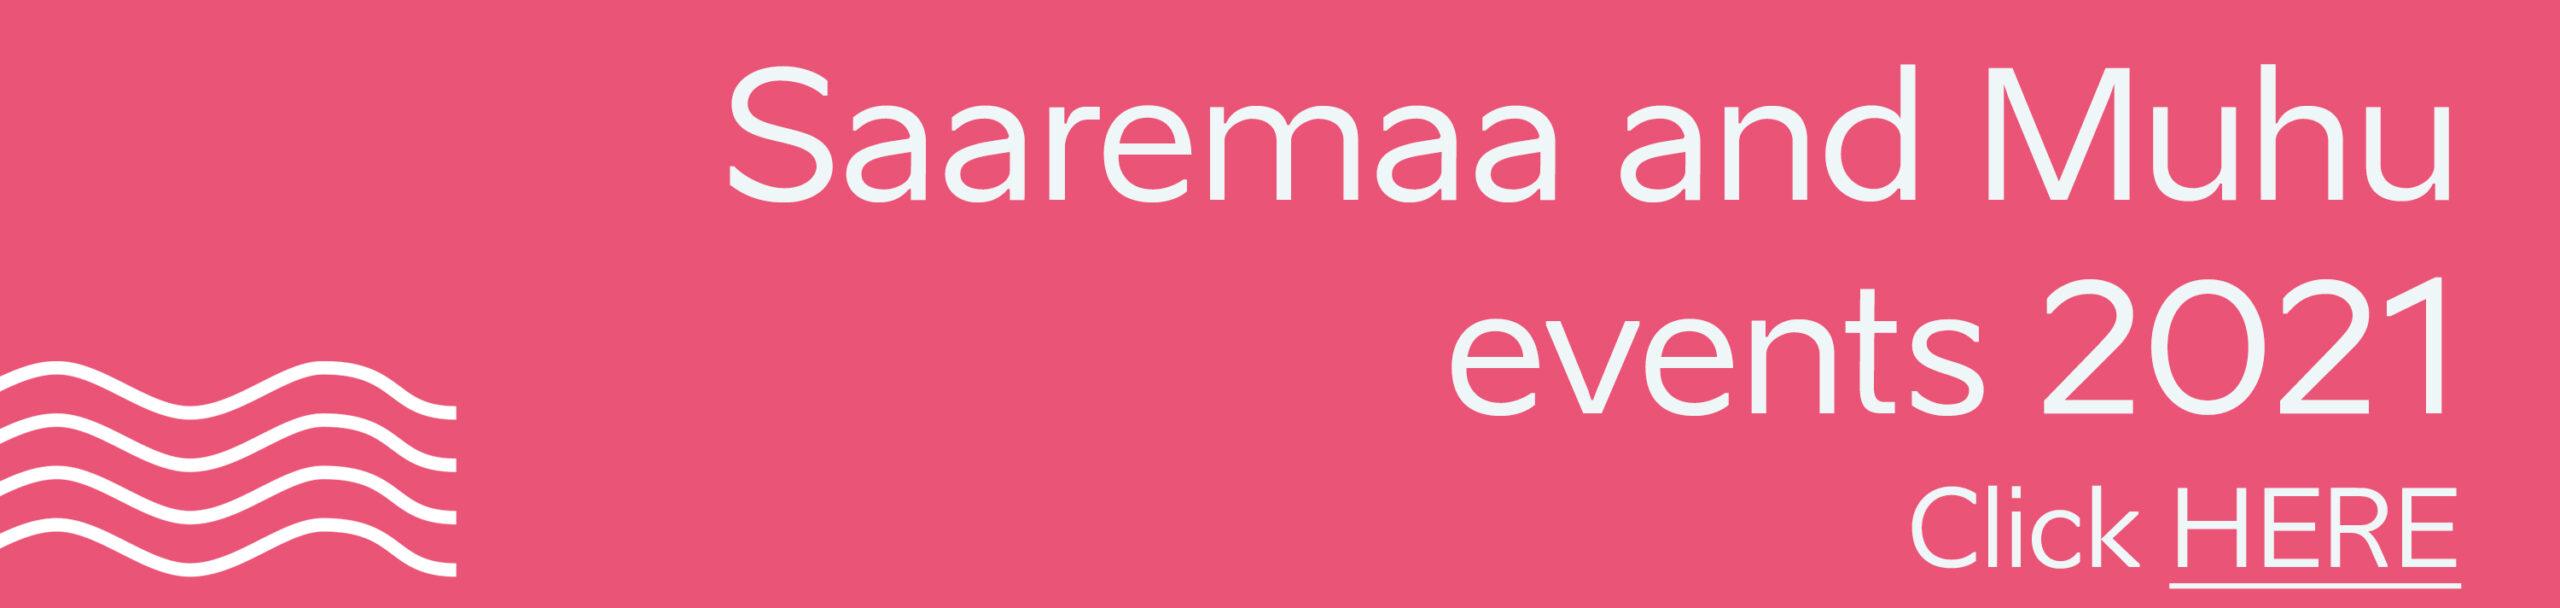 Saaremaa events 2021